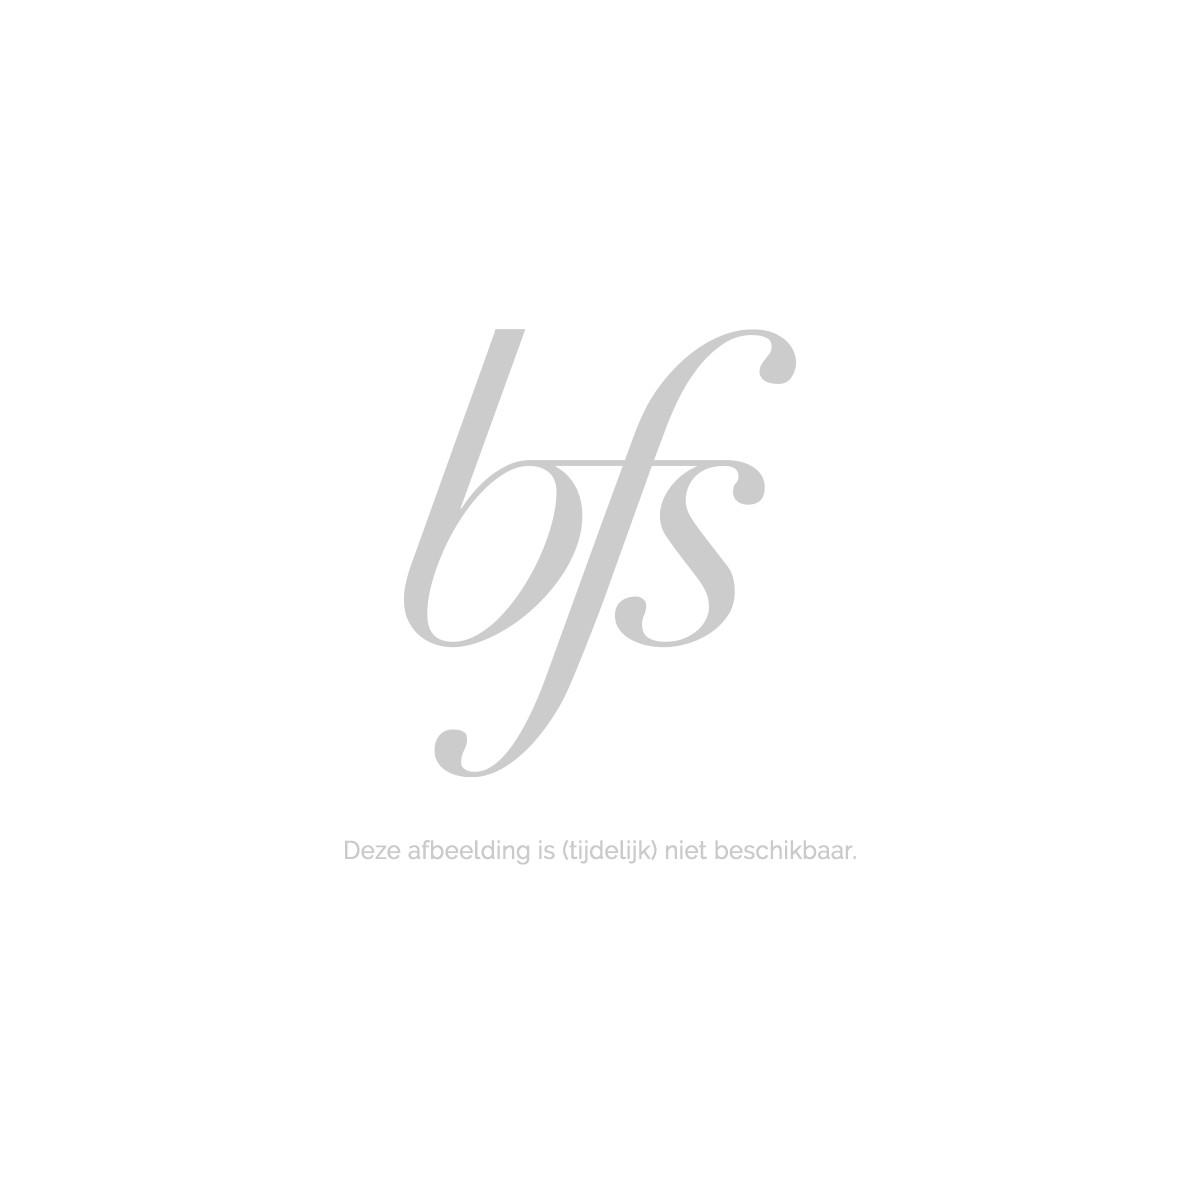 Diva Professional Styling Krultang Intelligent Digital Wand 16Mm-9Mm